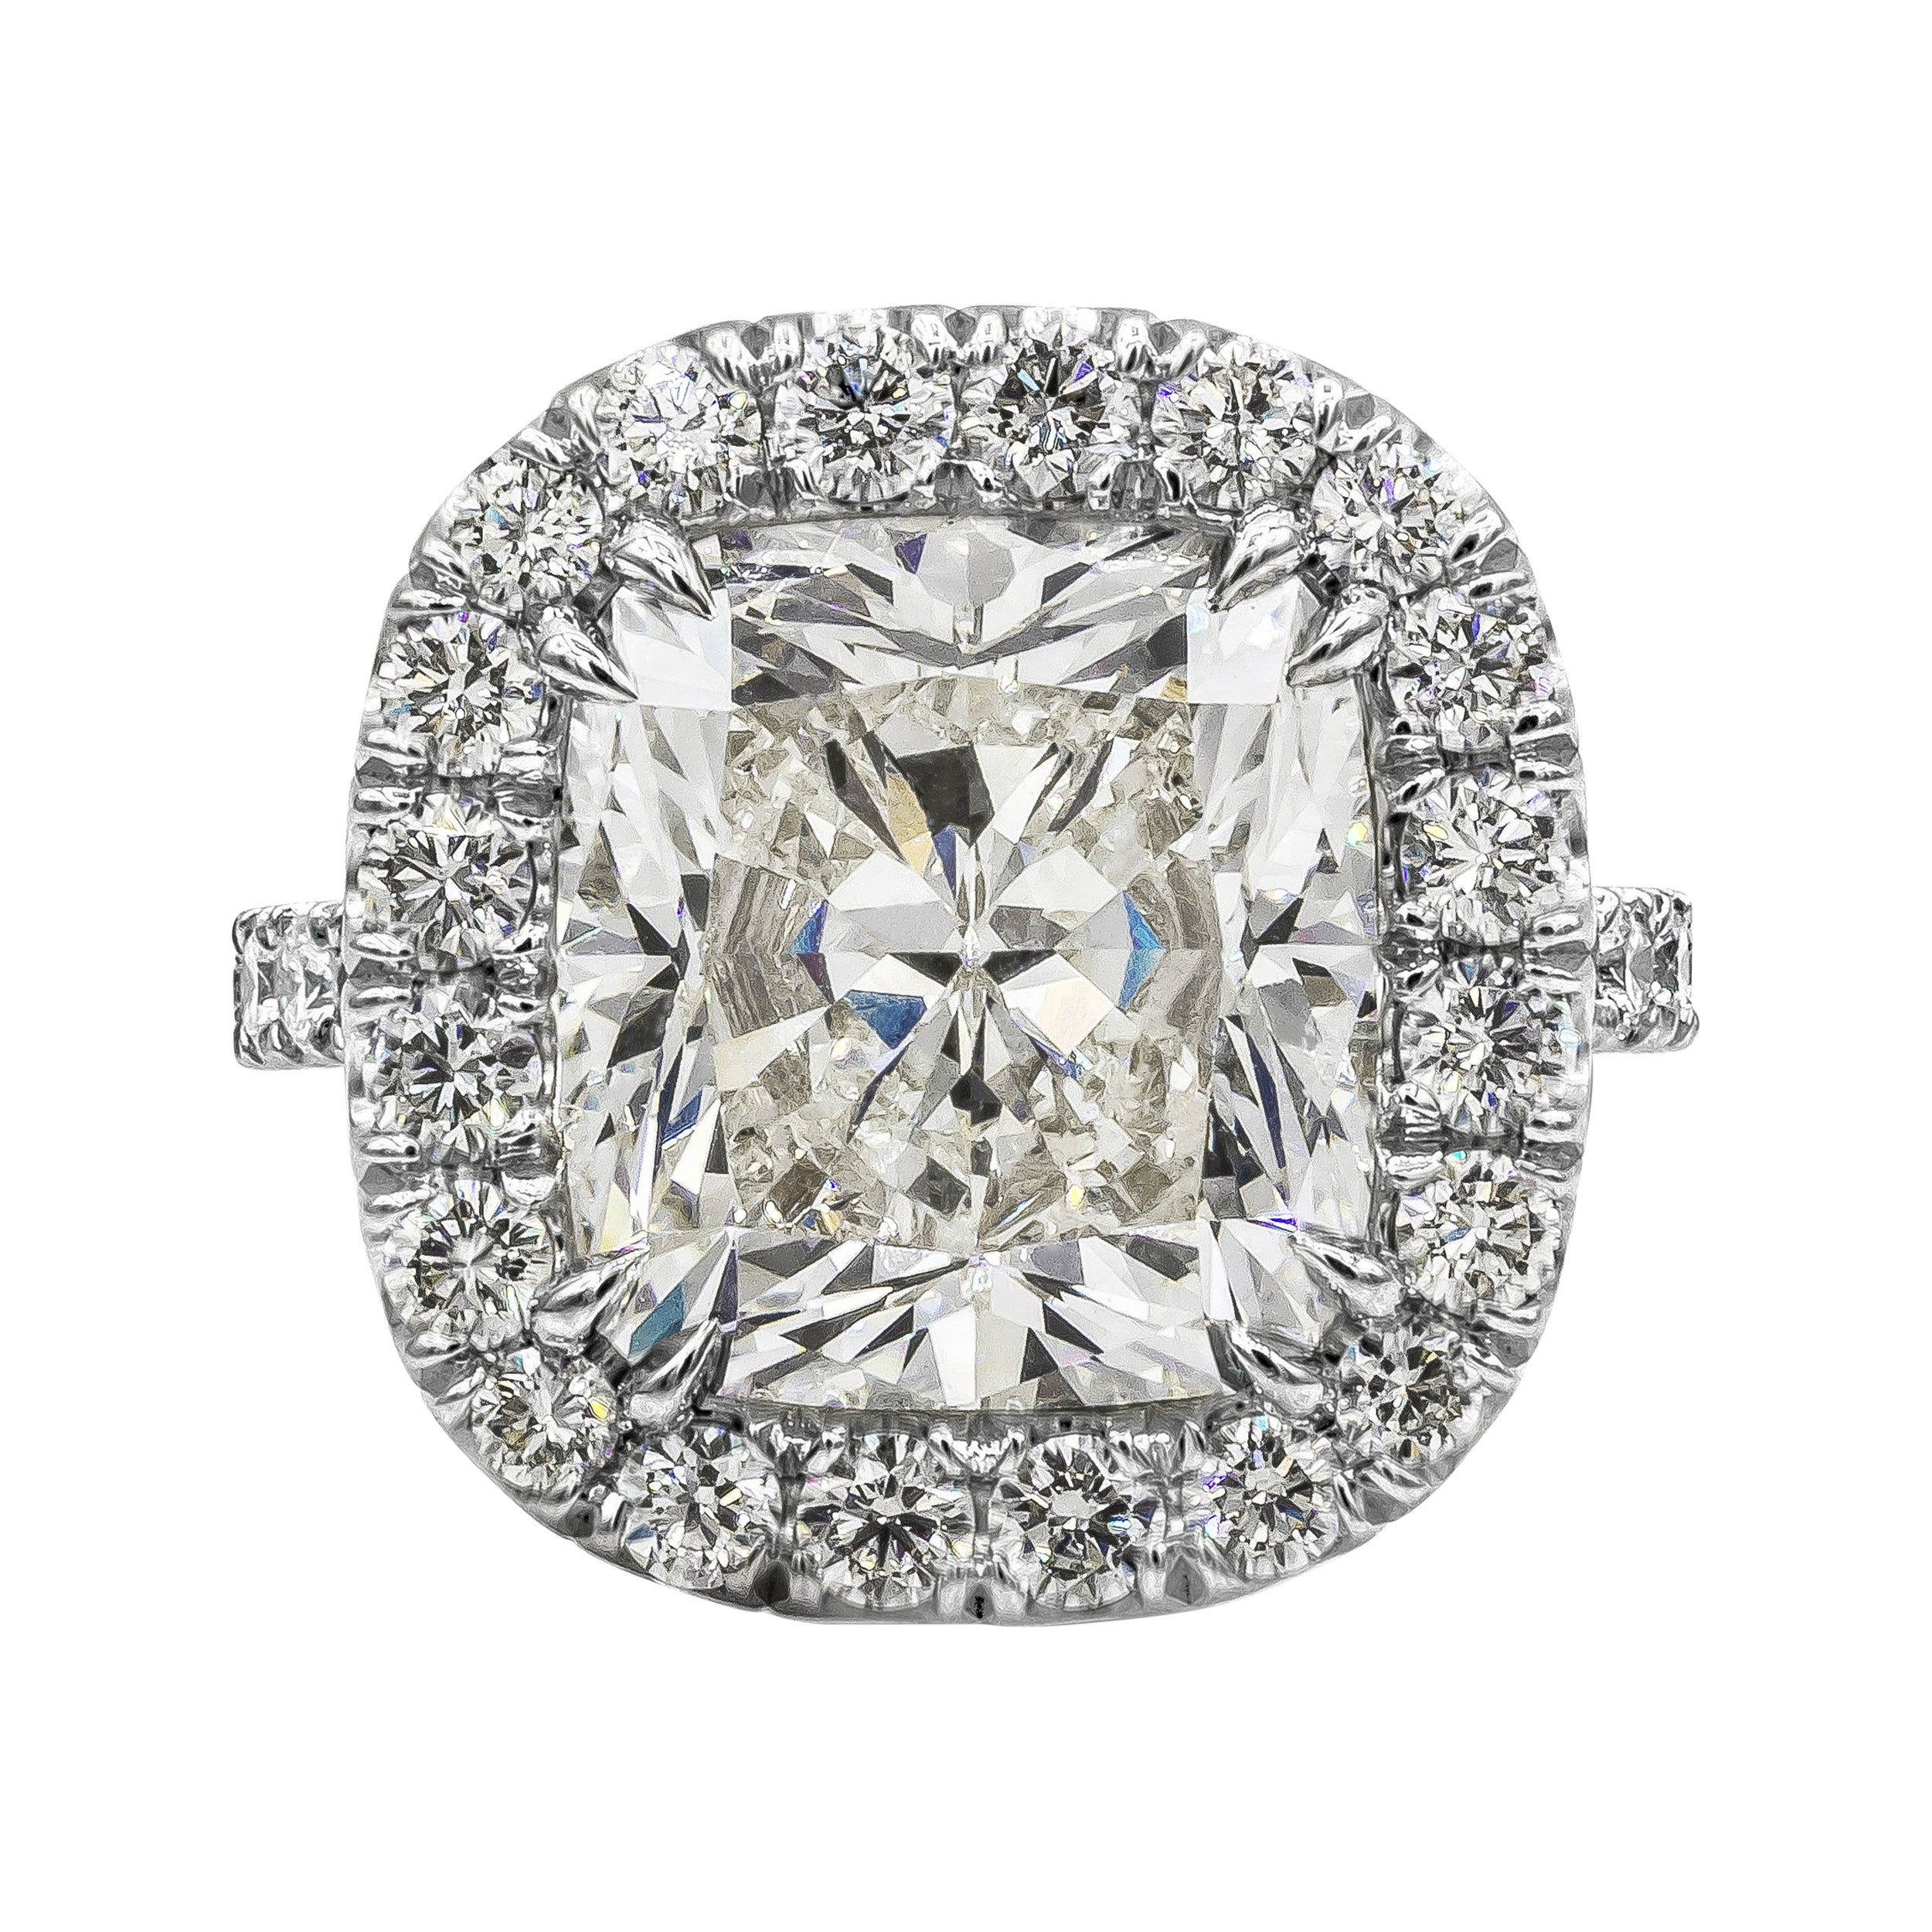 Roman Malakov, GIA Certified 10.12 Carat Cushion Diamond Halo Engagement Ring